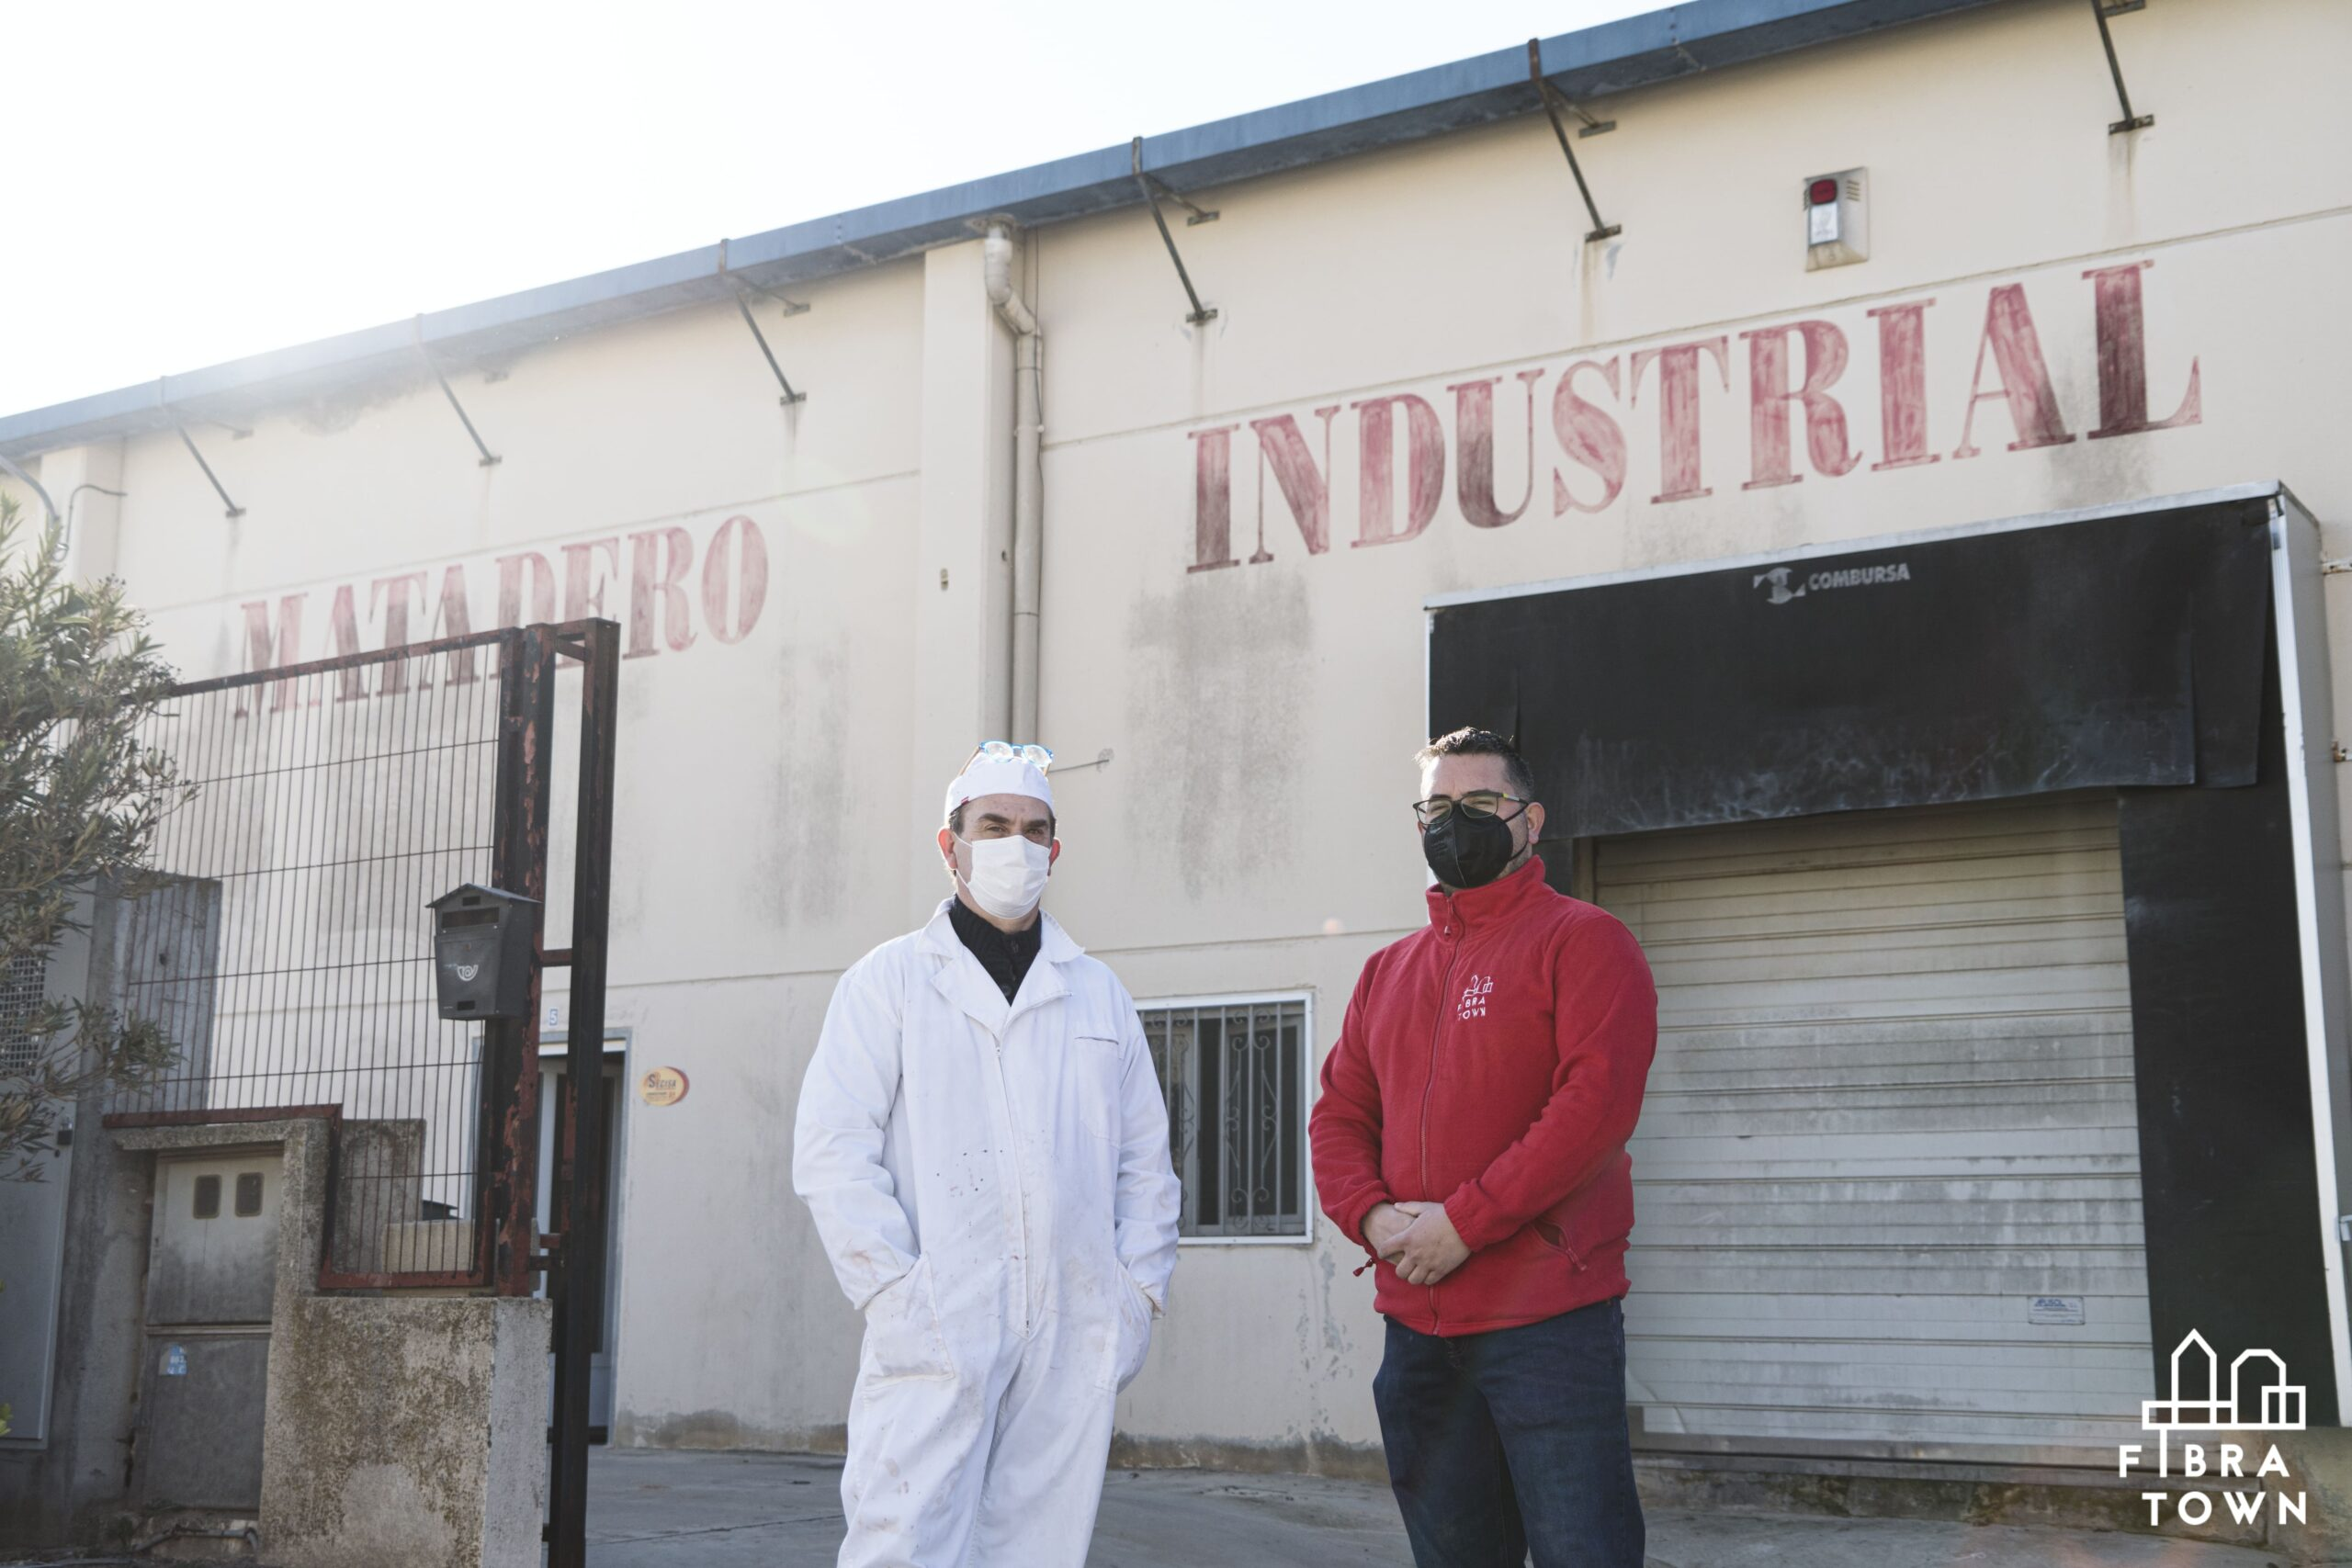 MATADERO INDUSTRIAL LA MANCHUELA